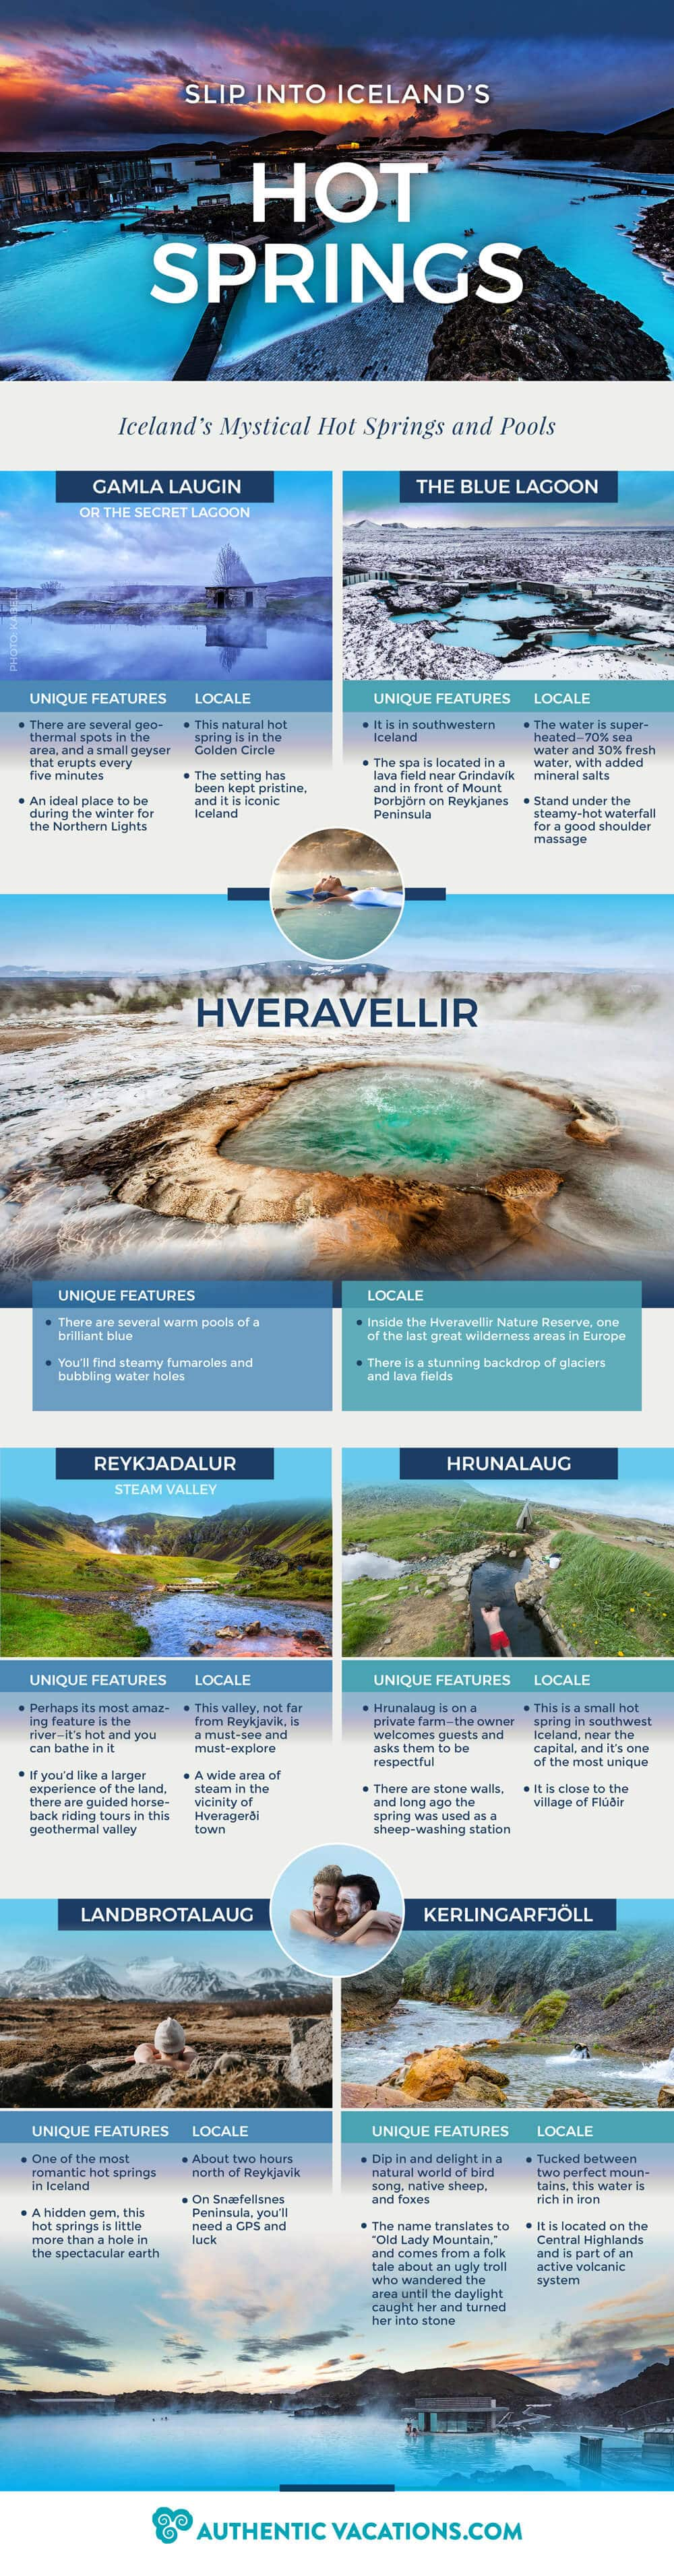 Slip Into Iceland's Hot Springs